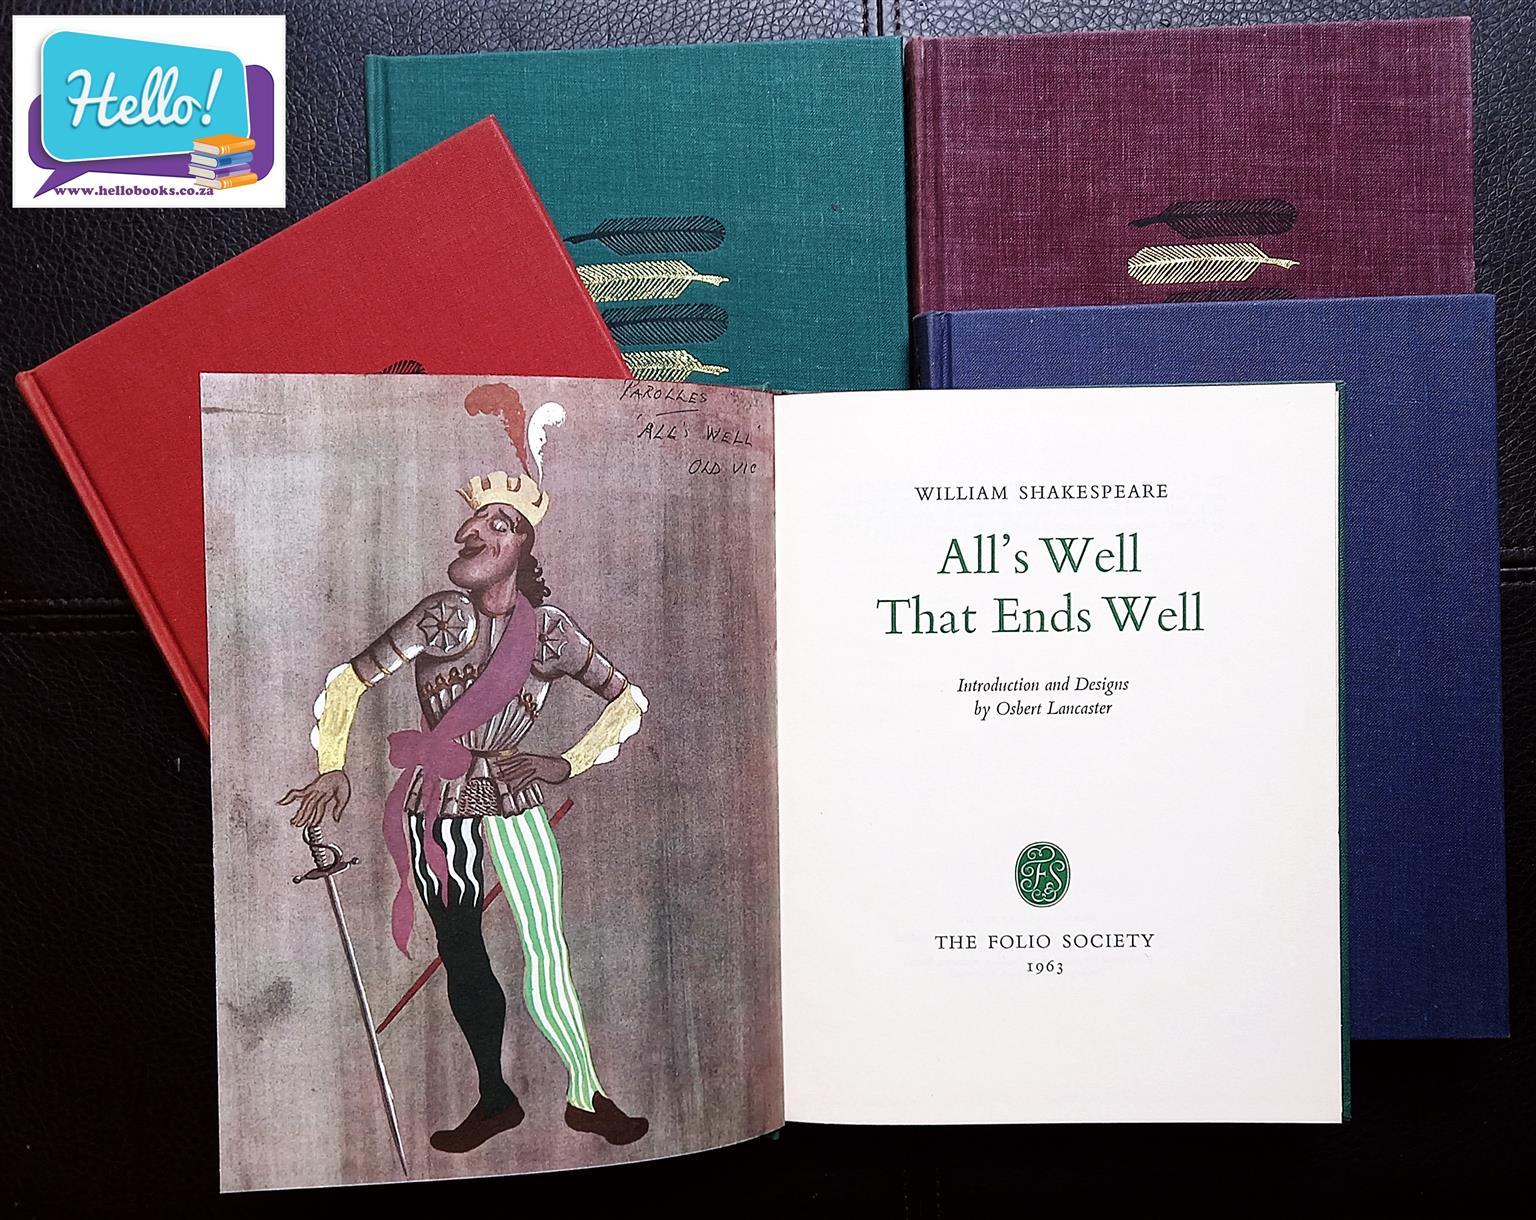 William Shakespeare The Folio Society